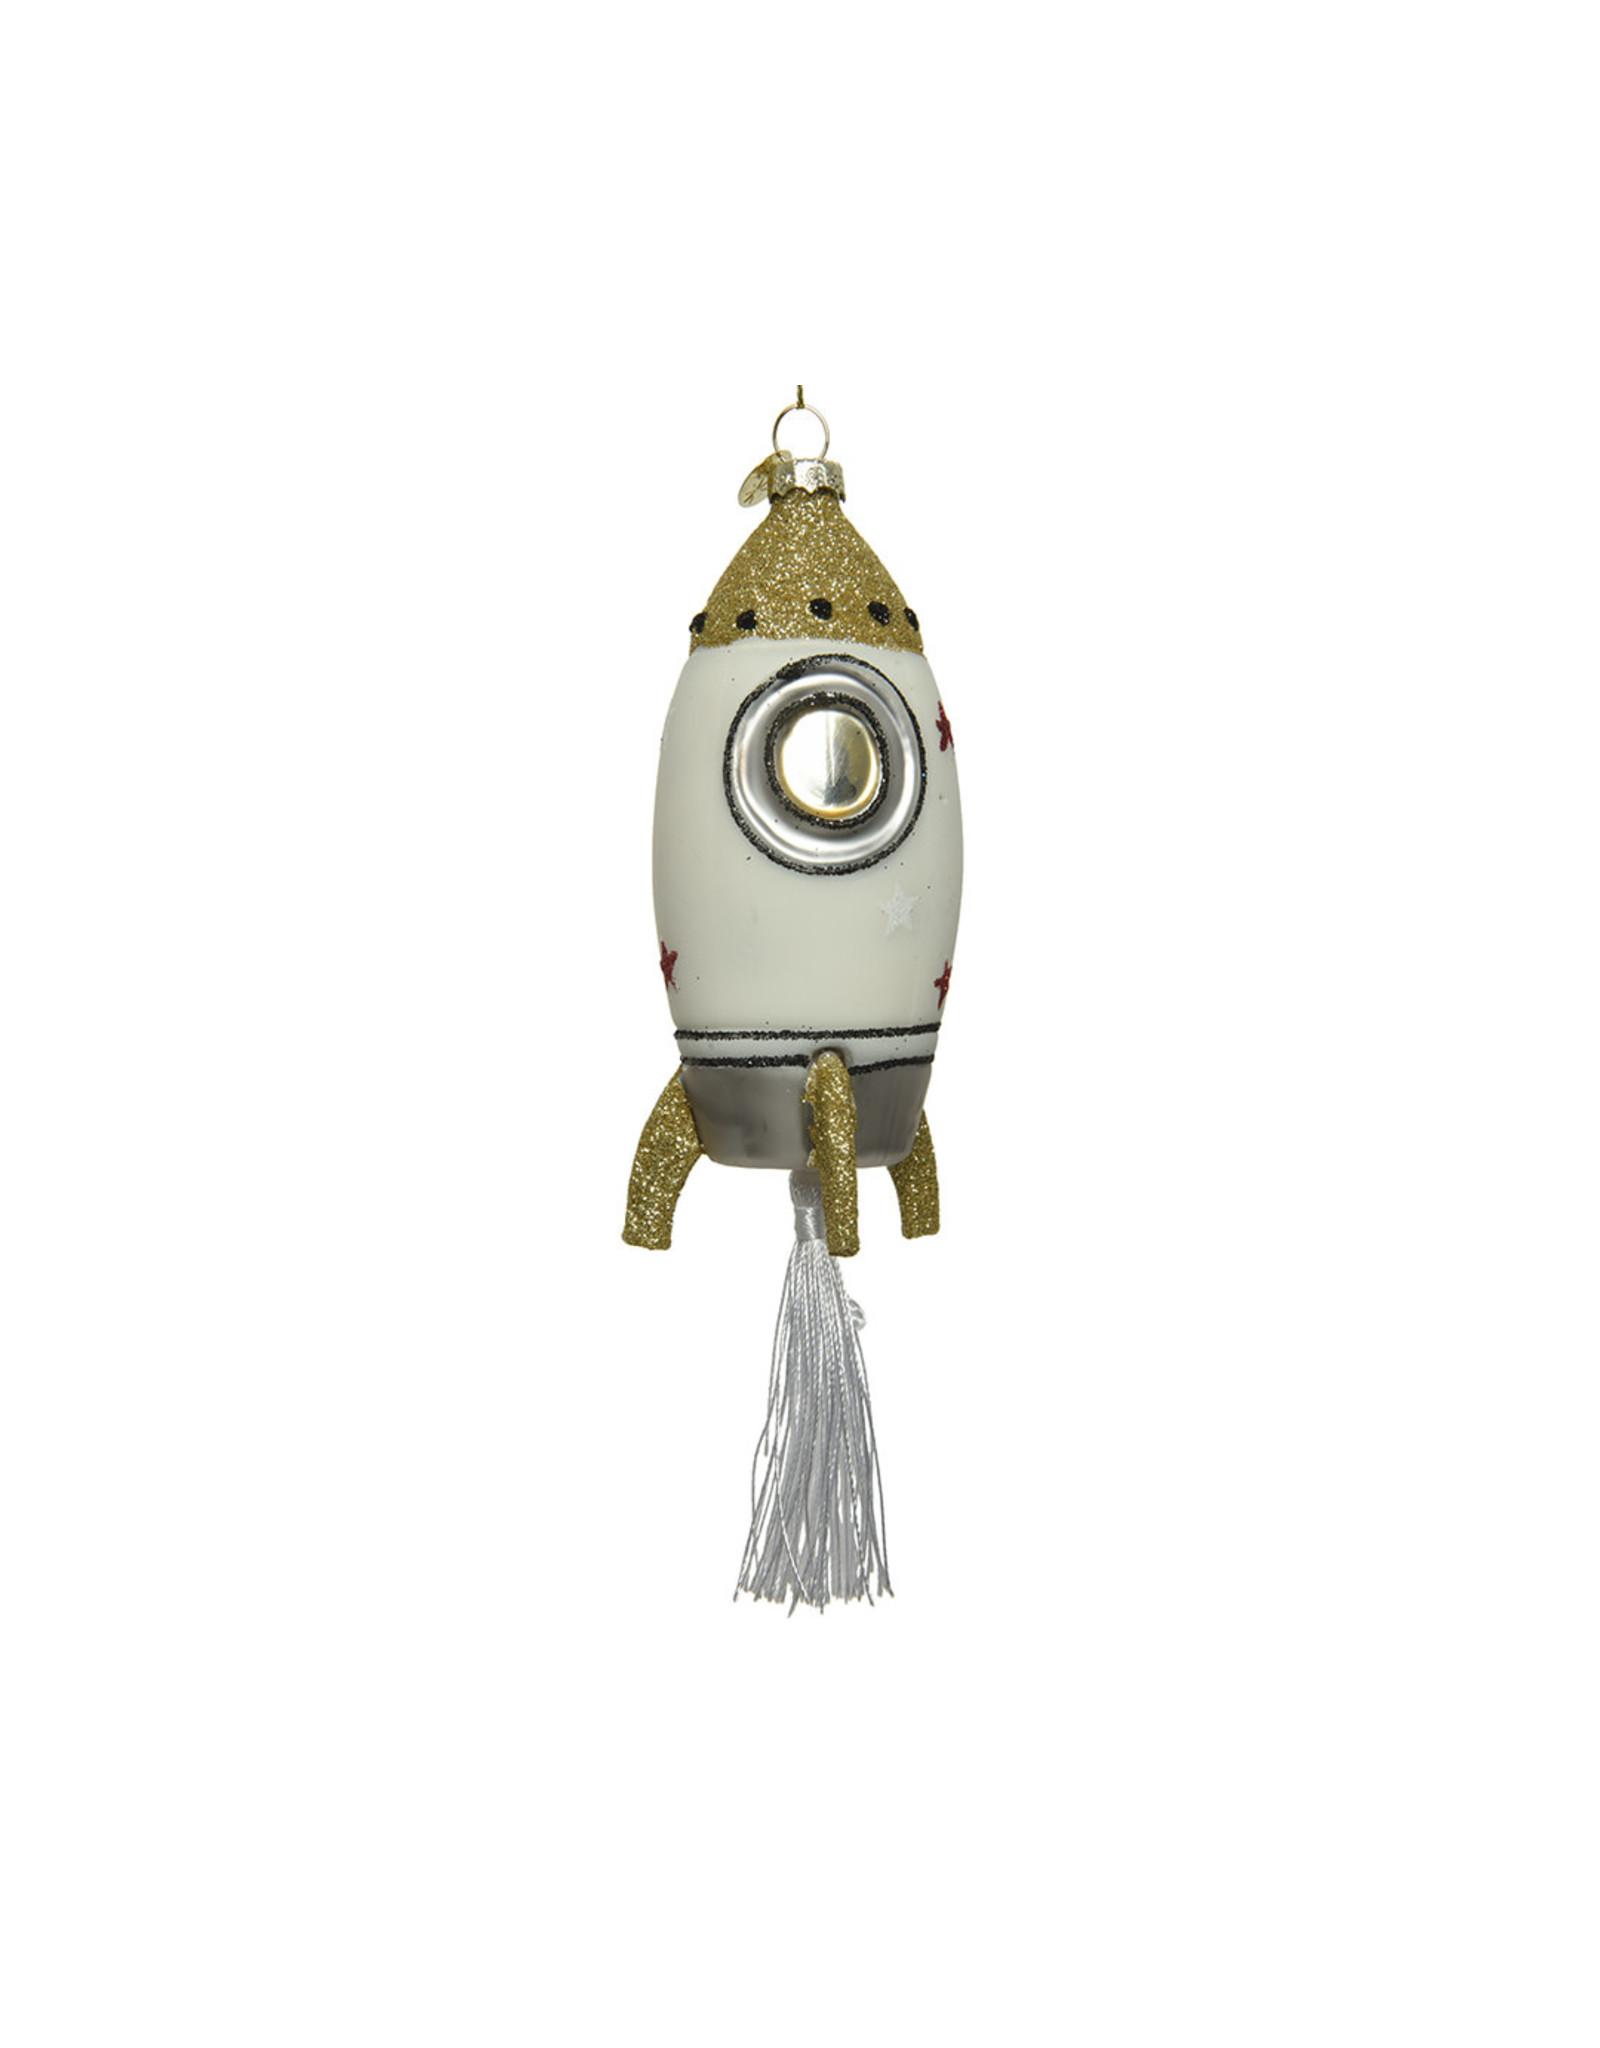 Kaemingk Glass ornament rocket with tassel